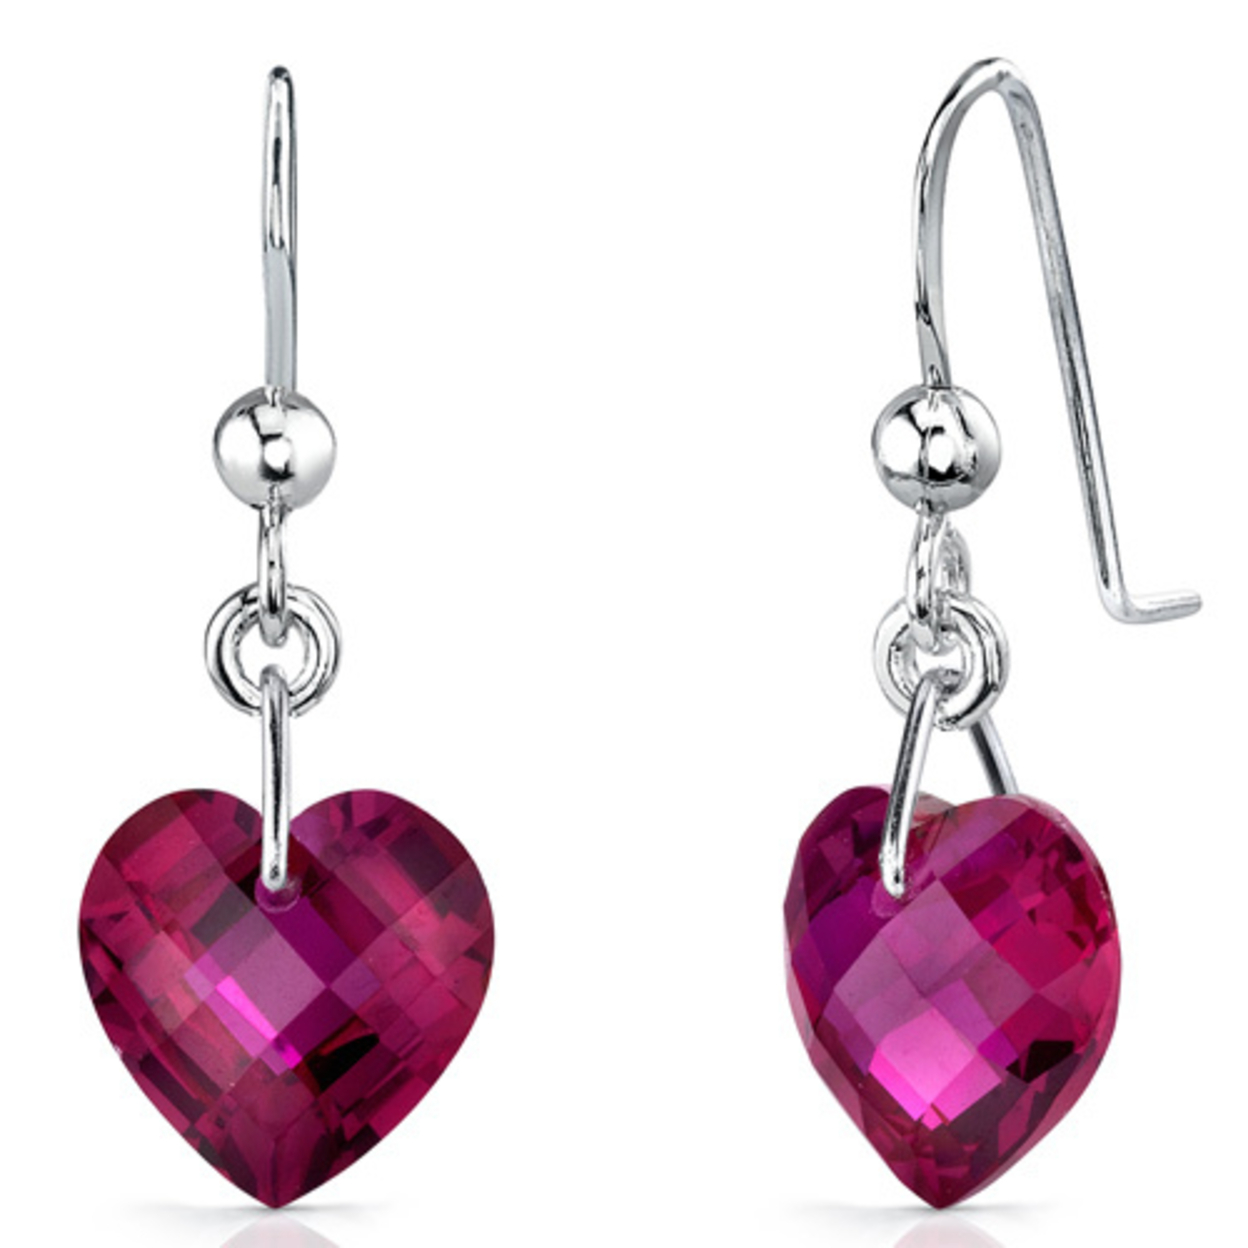 Gorgeous 9.50 Carats Heart Shape Ruby Earrings In Sterling Silver Style Se7098